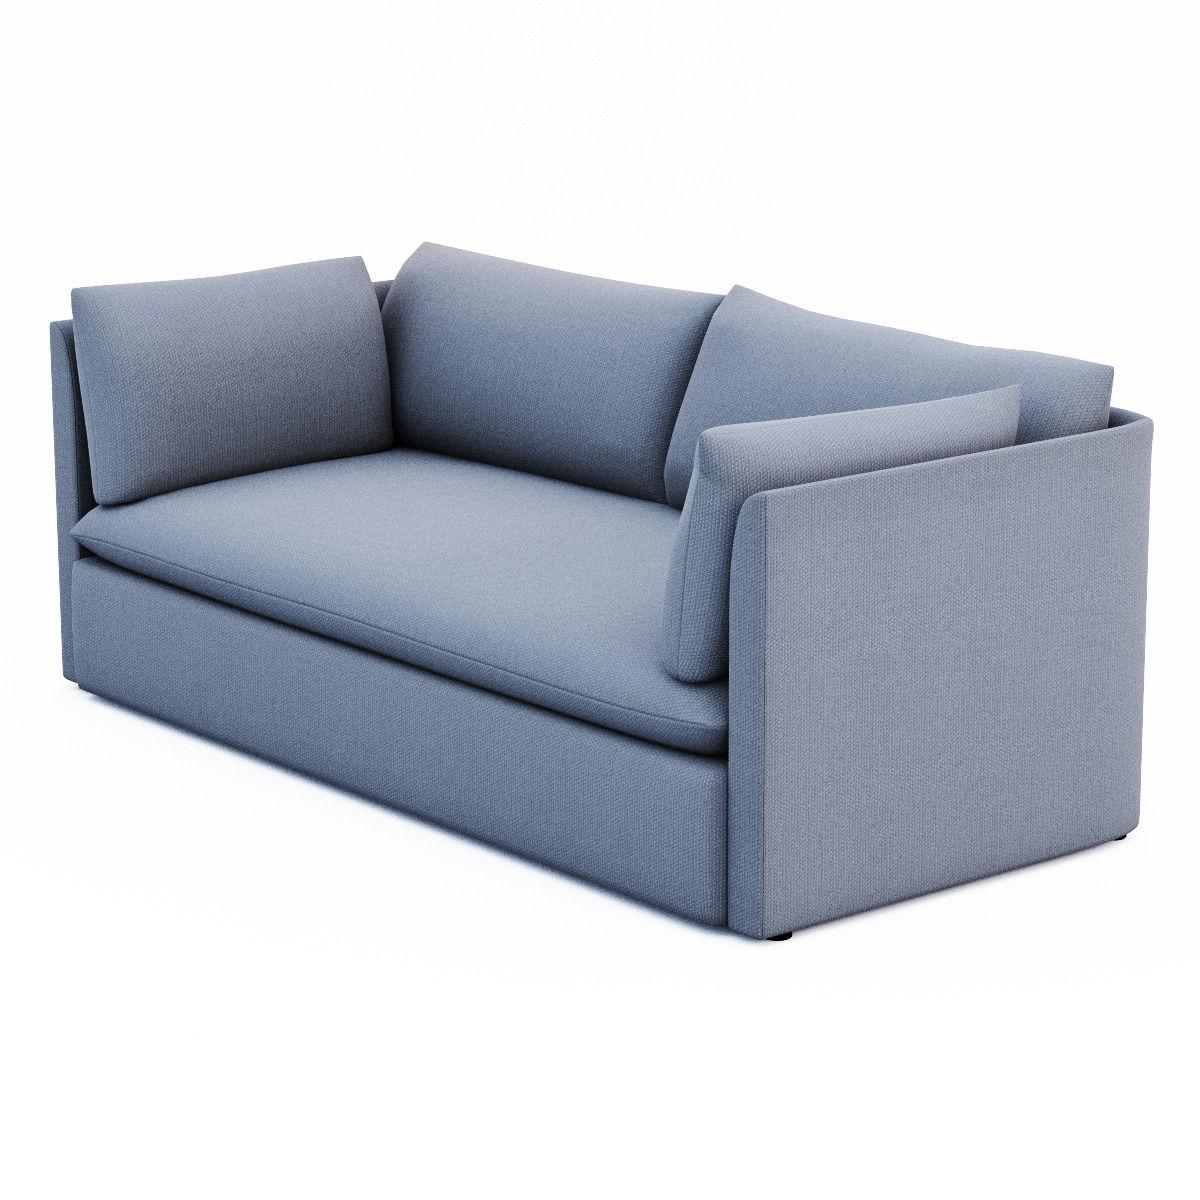 Contemporary Design Of Macys Sleeper Sofa Sectional